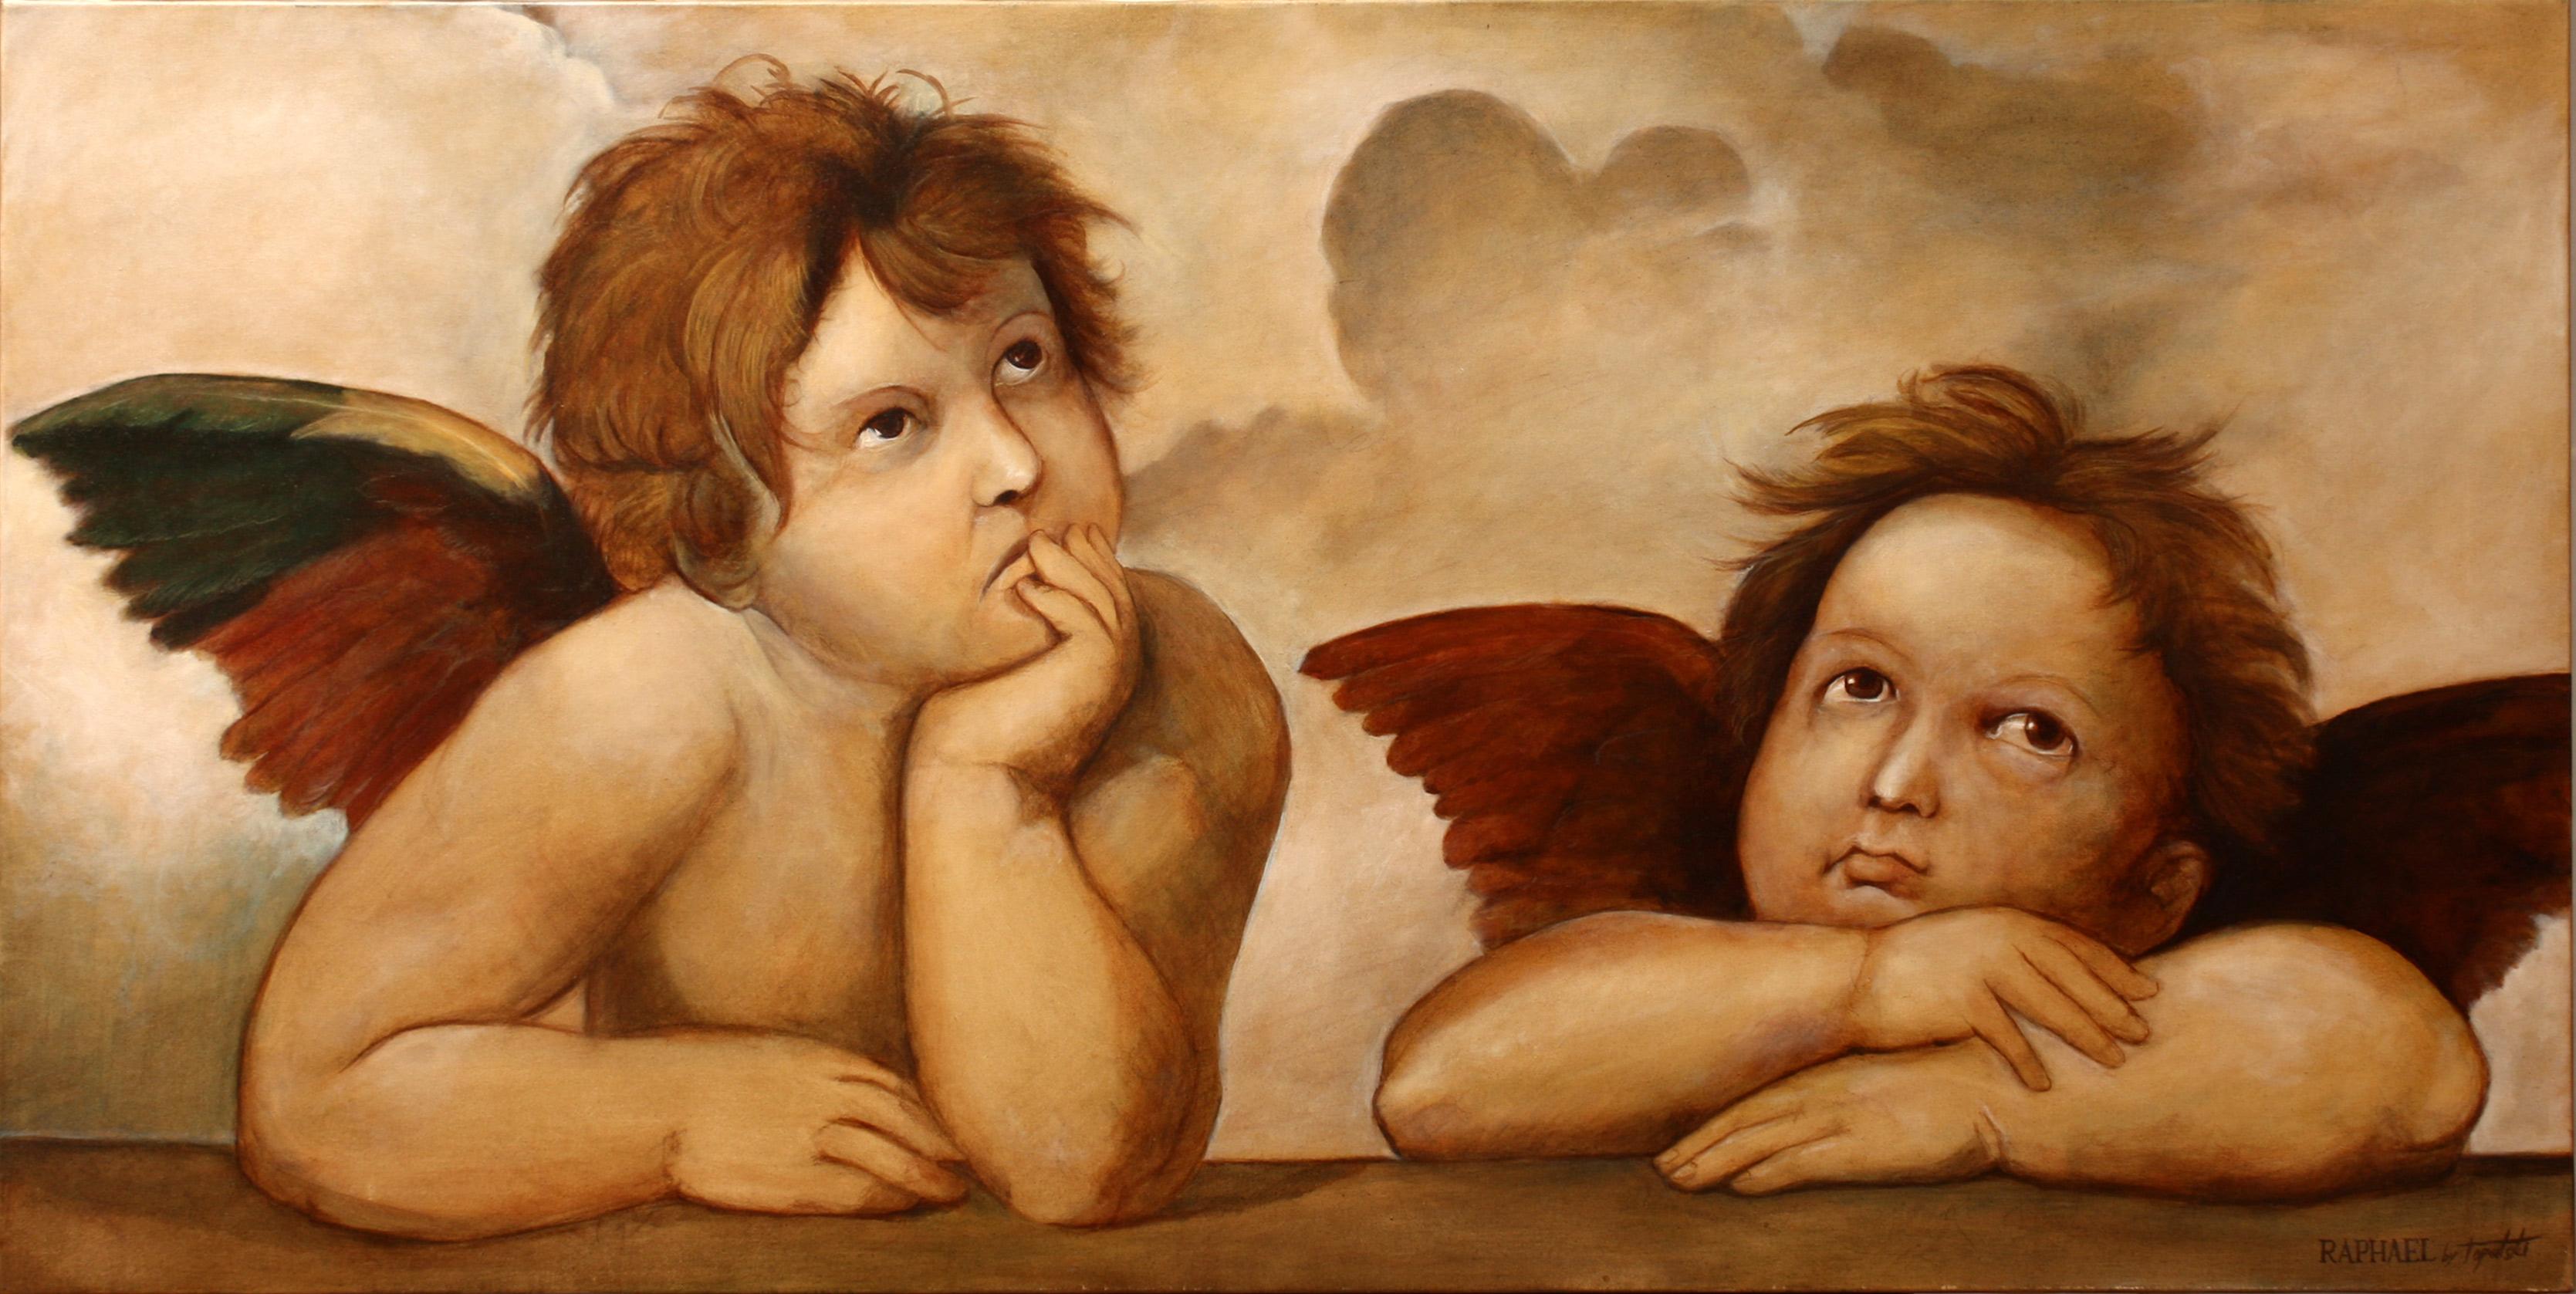 Little angels pics nude